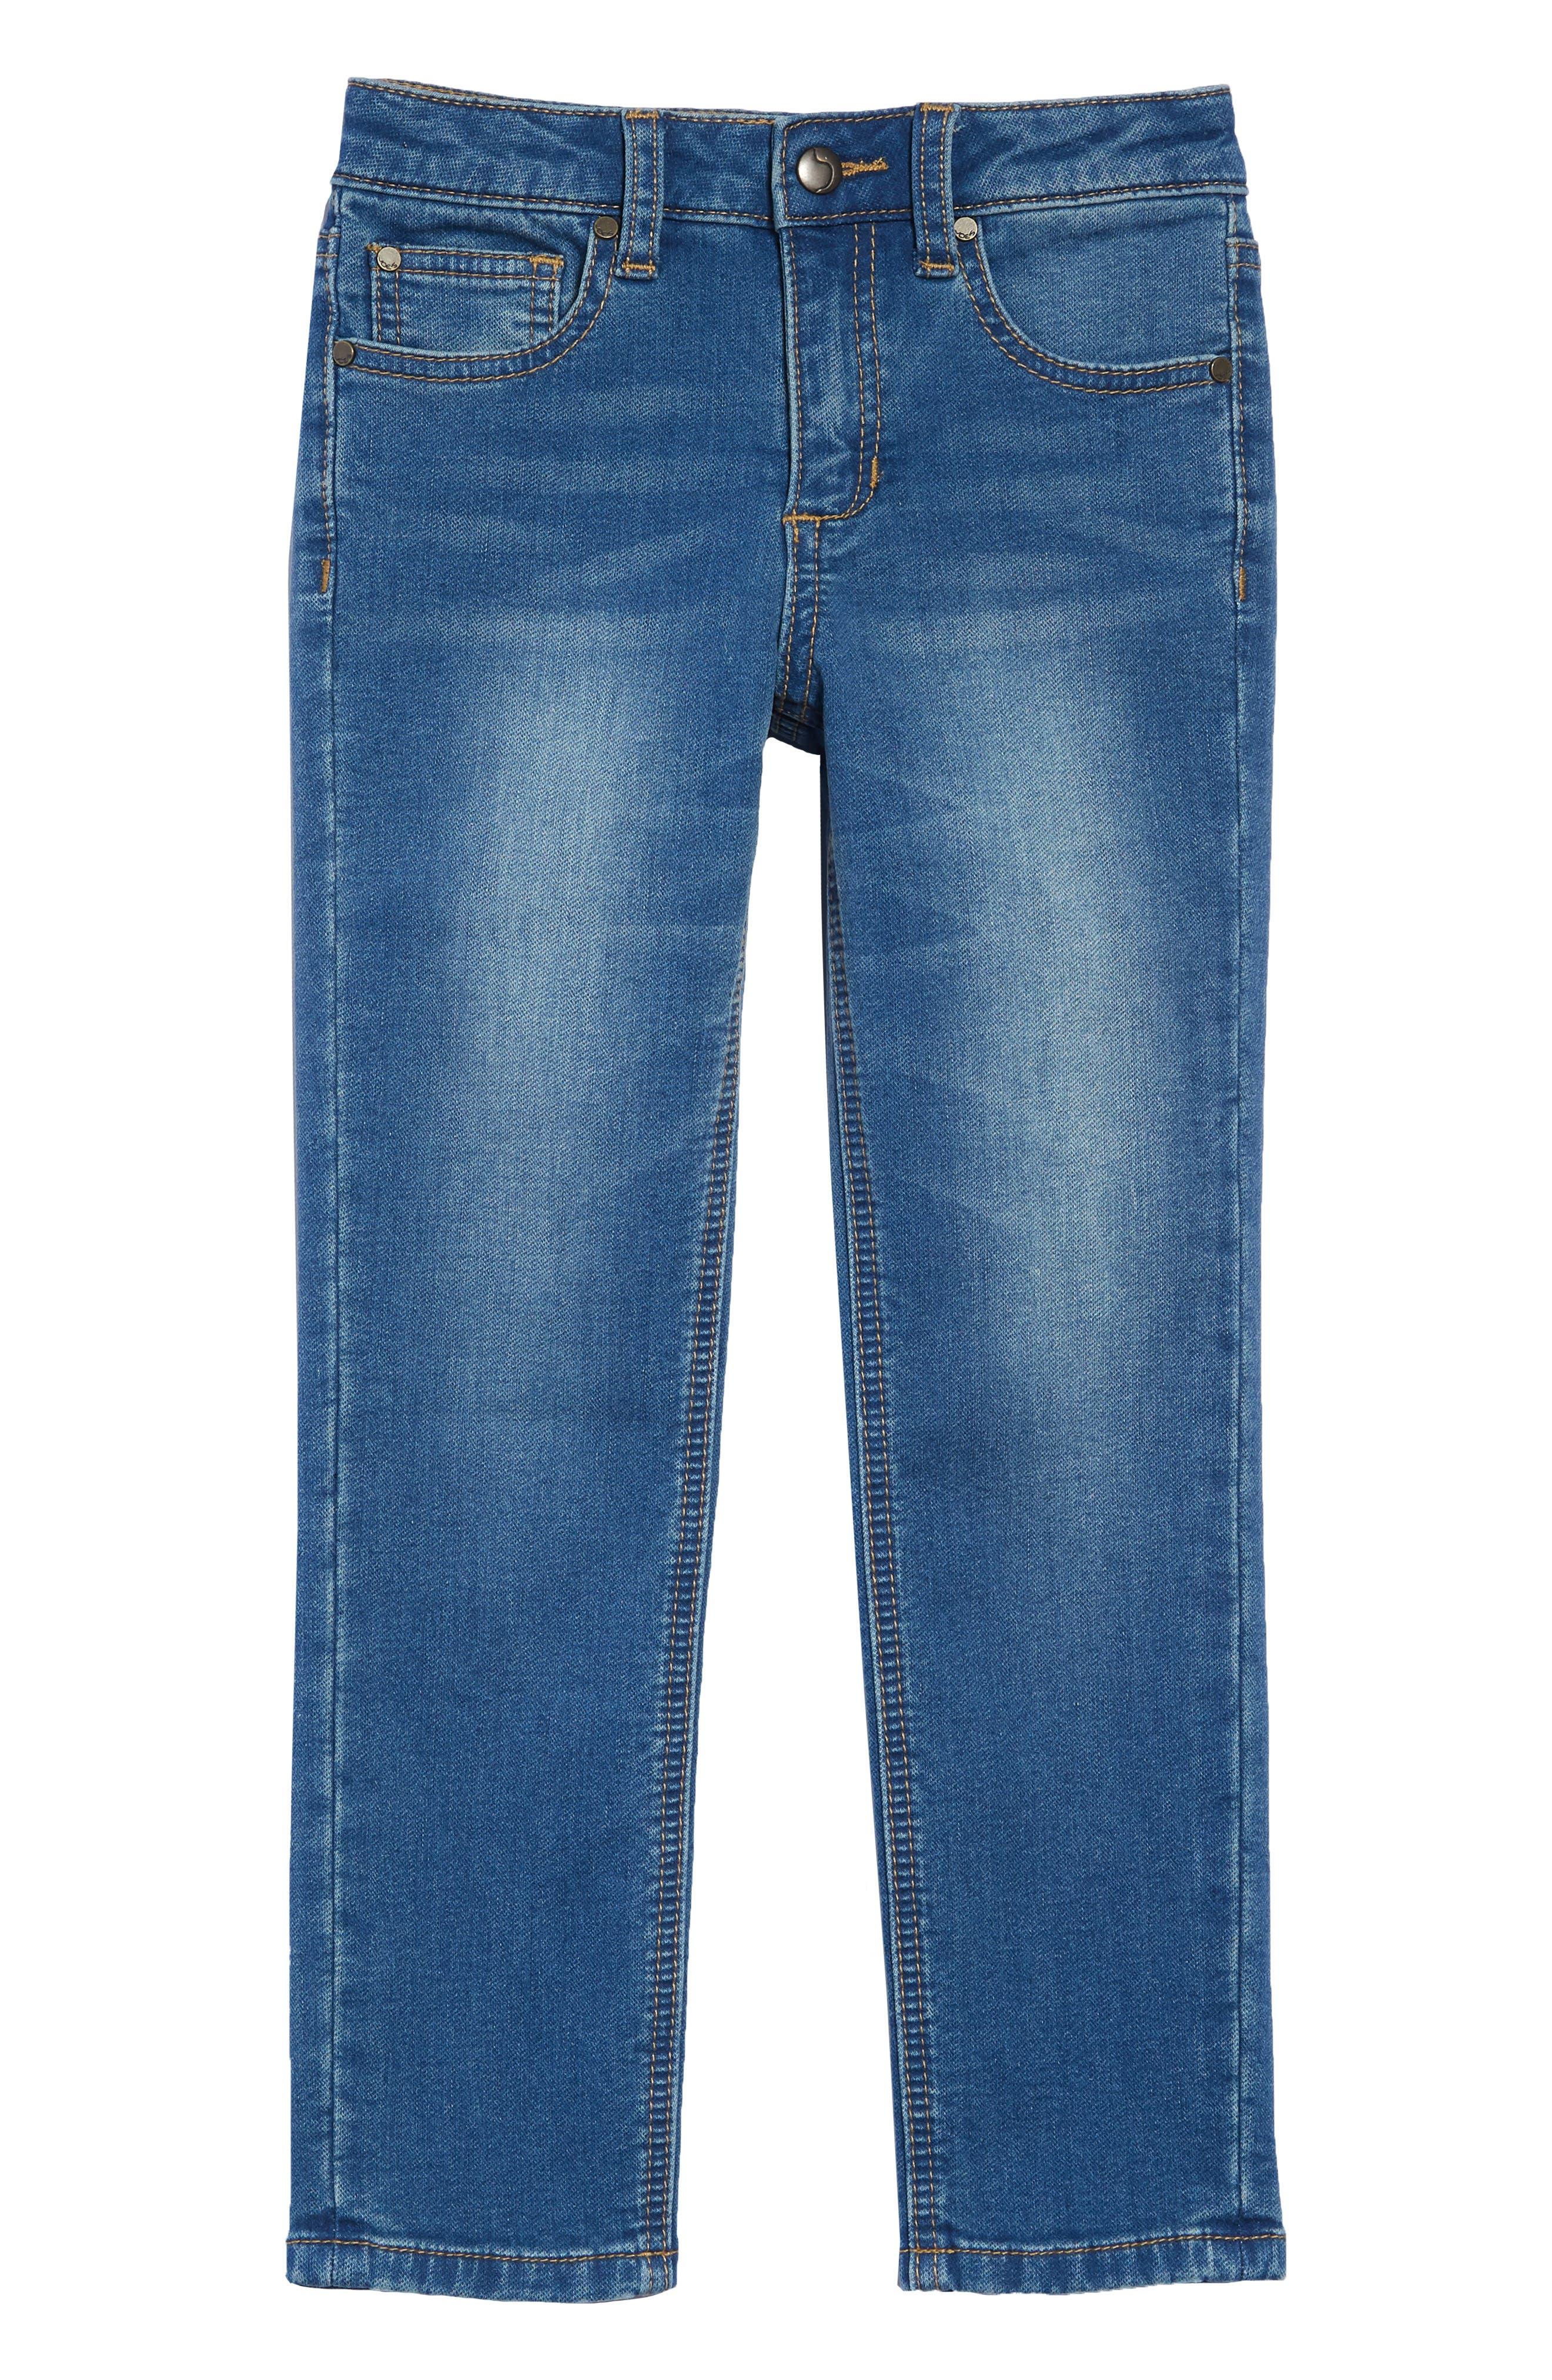 Boys Joes Brixton Straight Leg Knit Denim Jeans Size 10  Blue